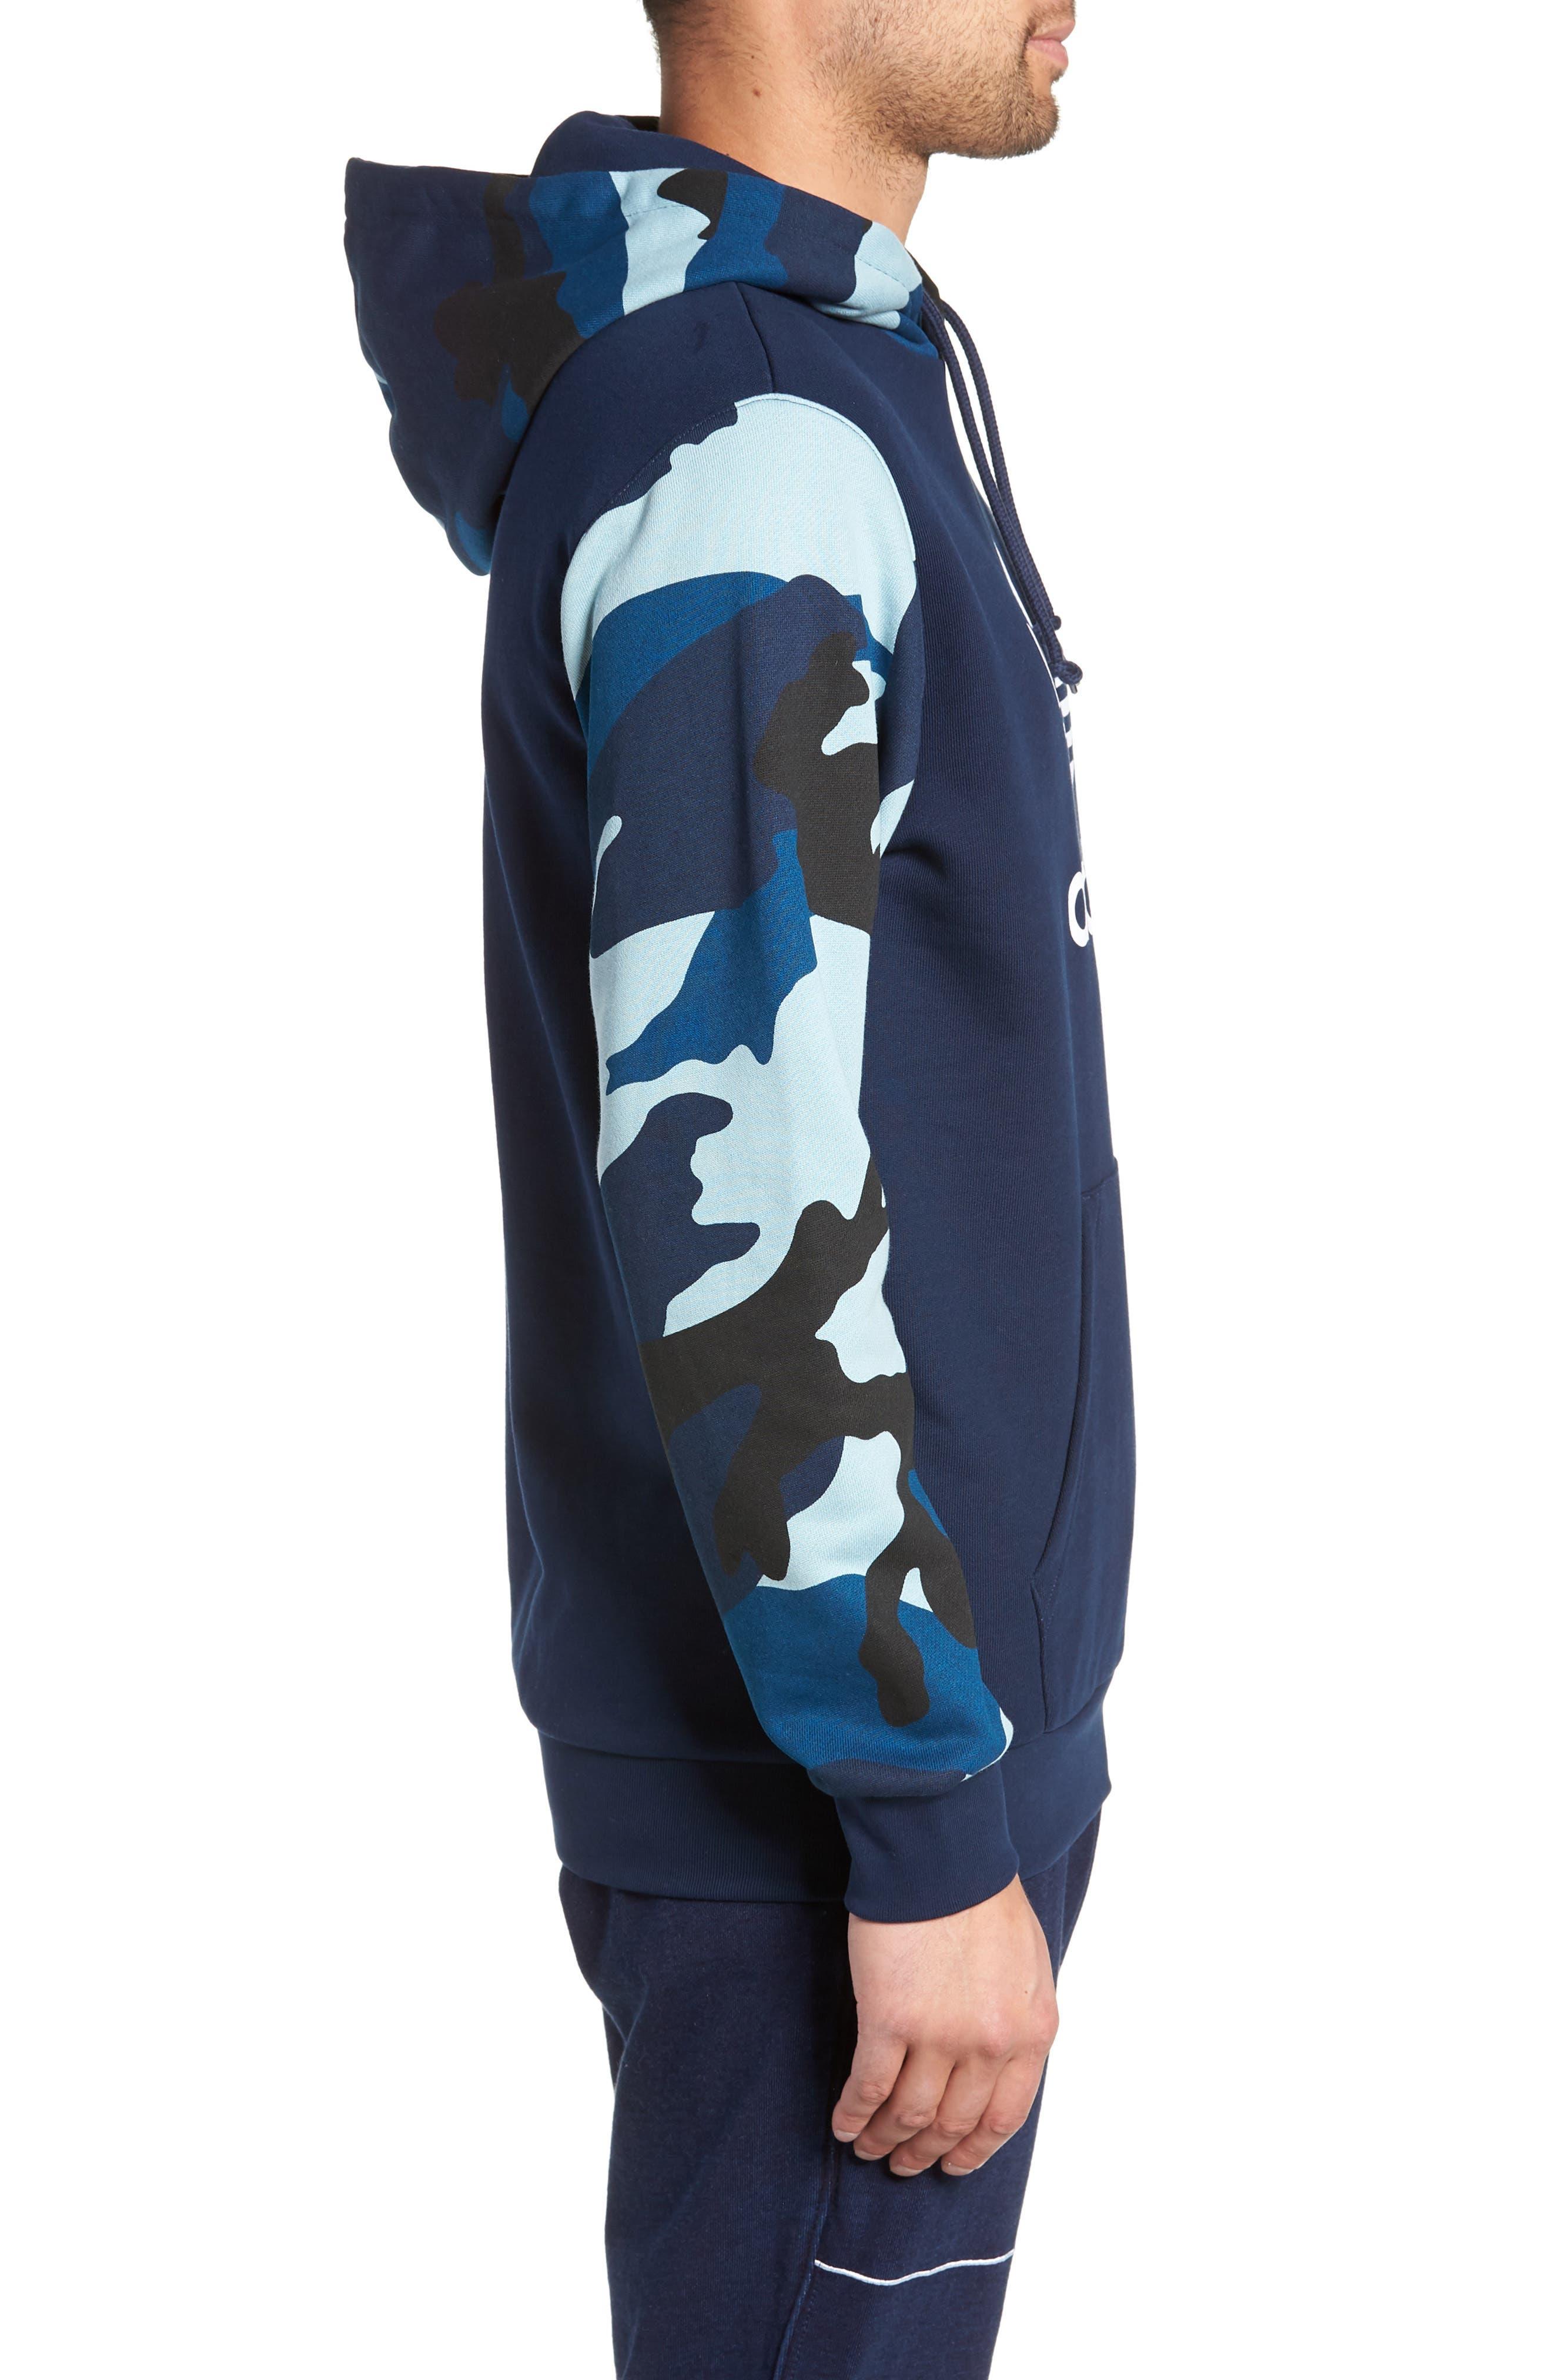 ADIDAS ORIGINALS, Camo Hooded Sweatshirt, Alternate thumbnail 3, color, COLLEGIATE NAVY